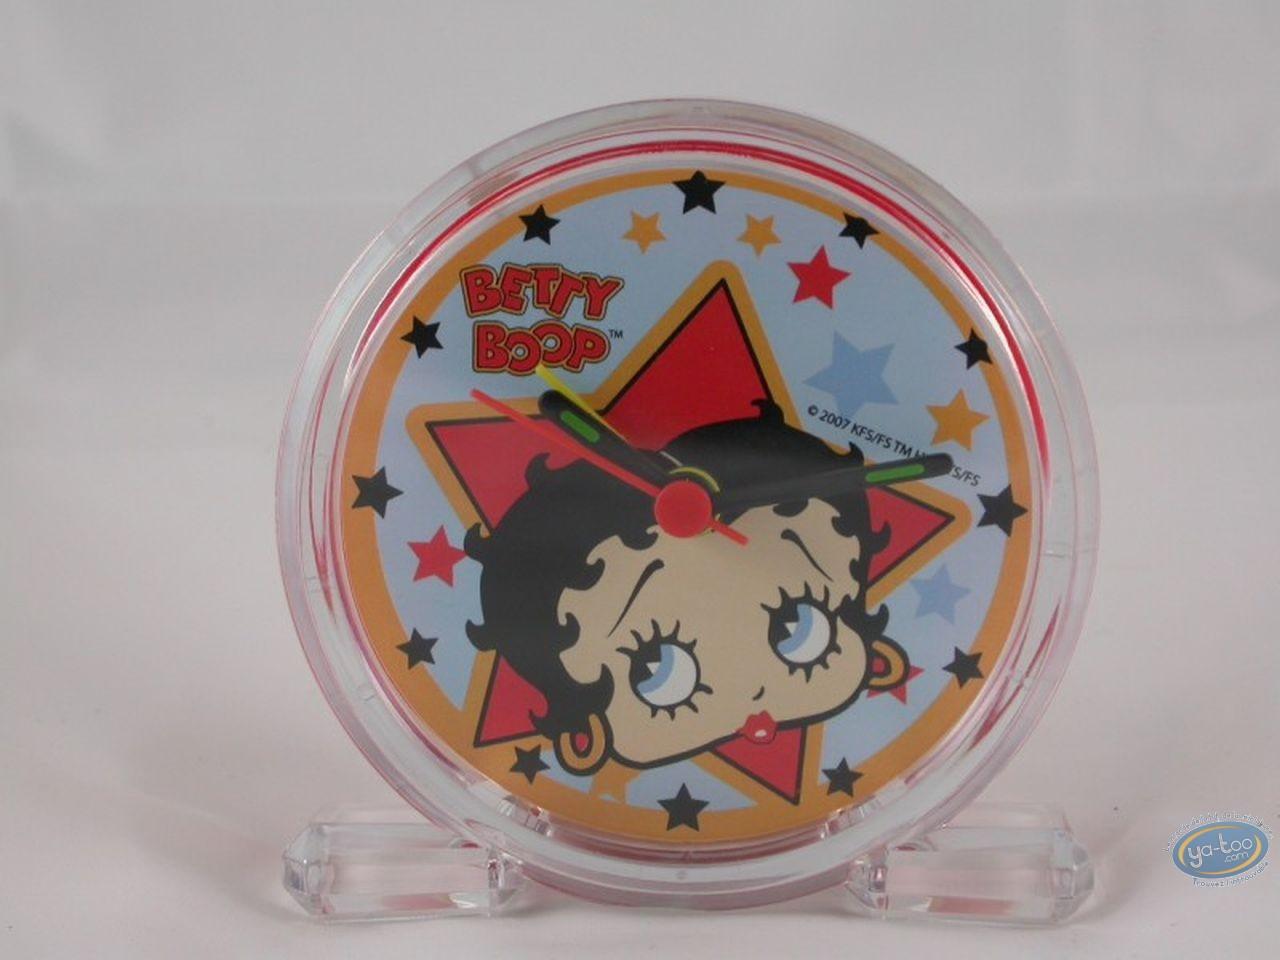 Horlogerie, Betty Boop : Réveil, Betty Boop 'La Star'.